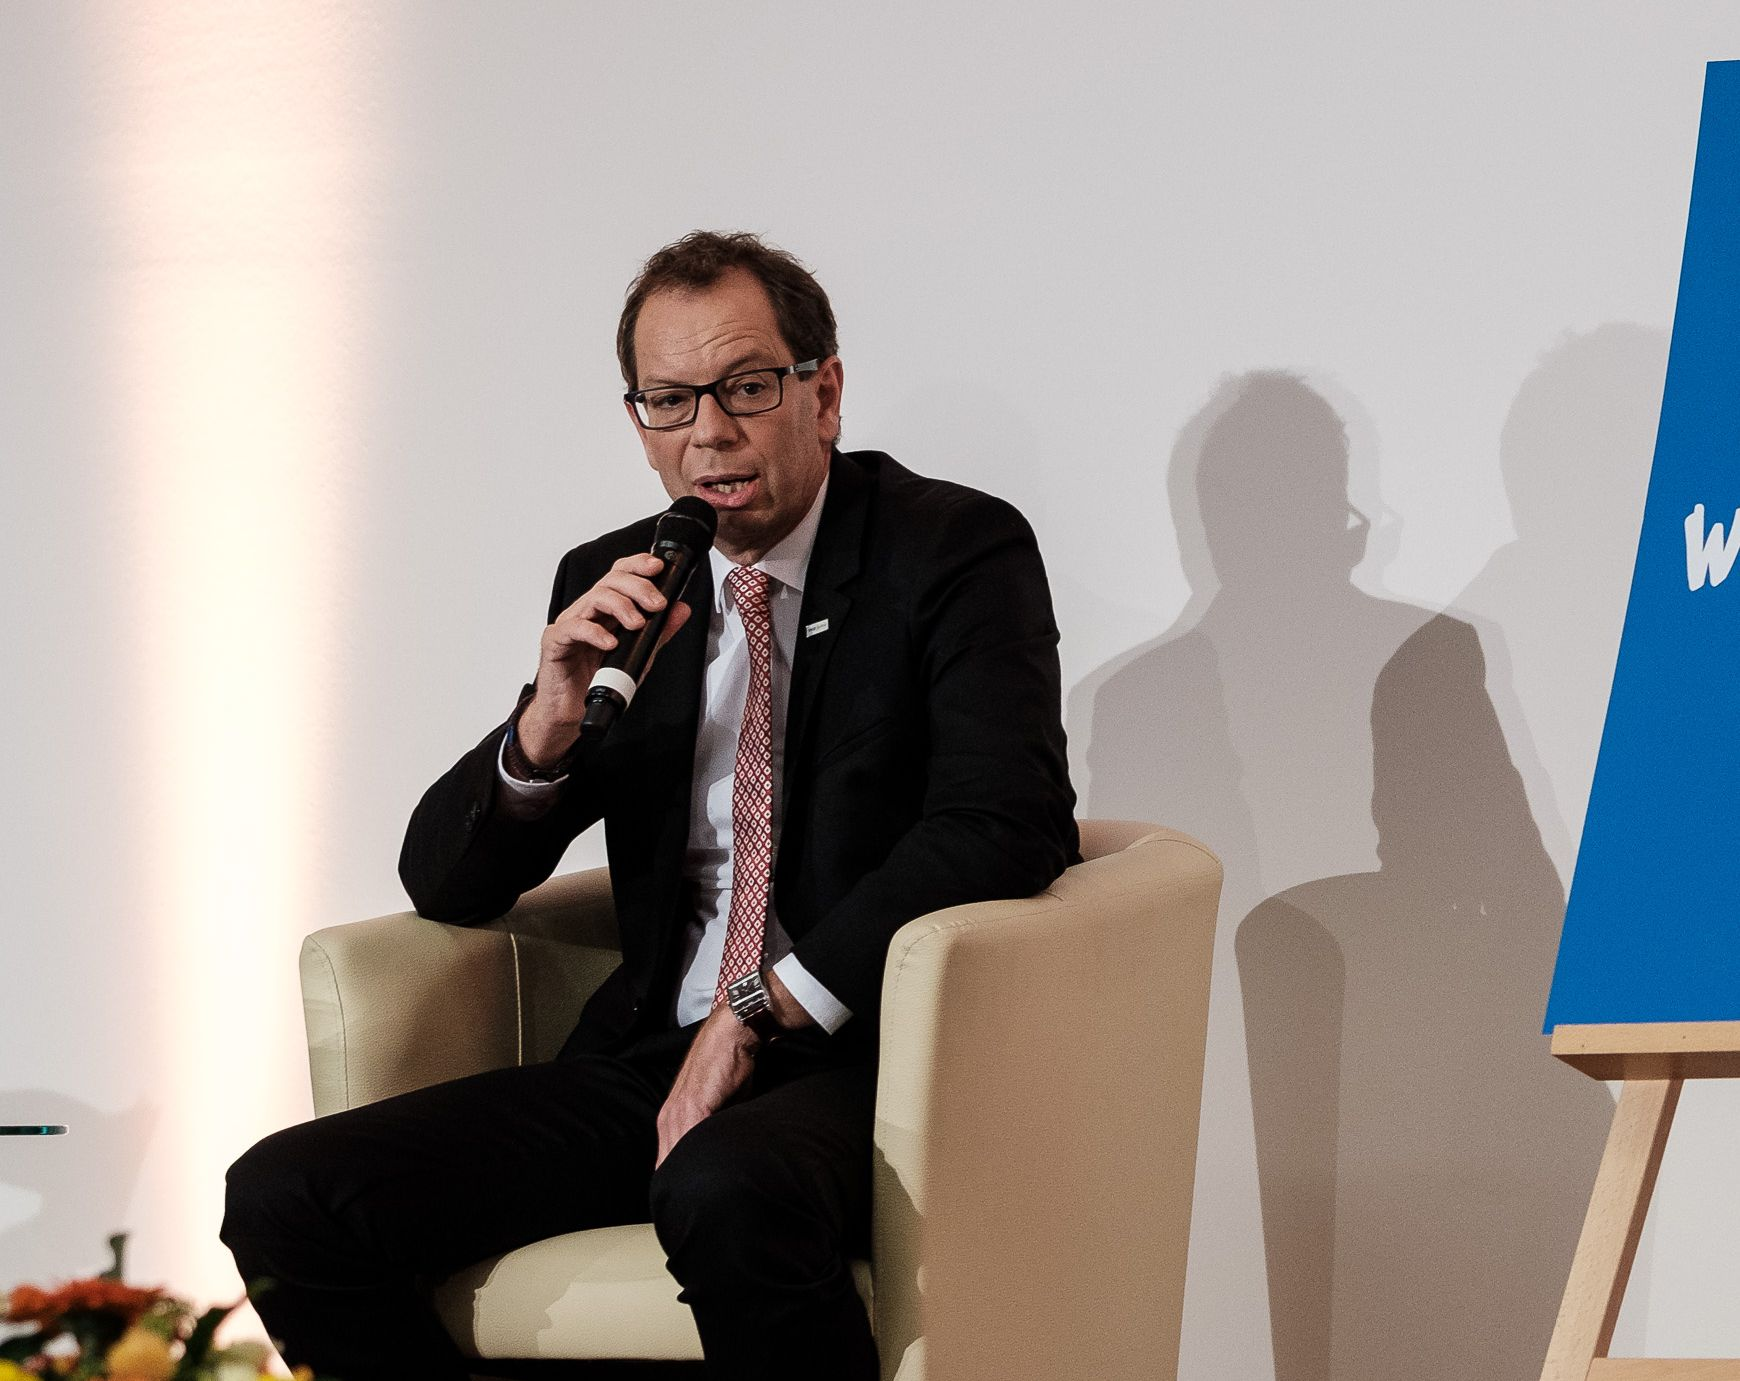 Mag. Christoph Wurm, Generaldirektor der VKB-Bank